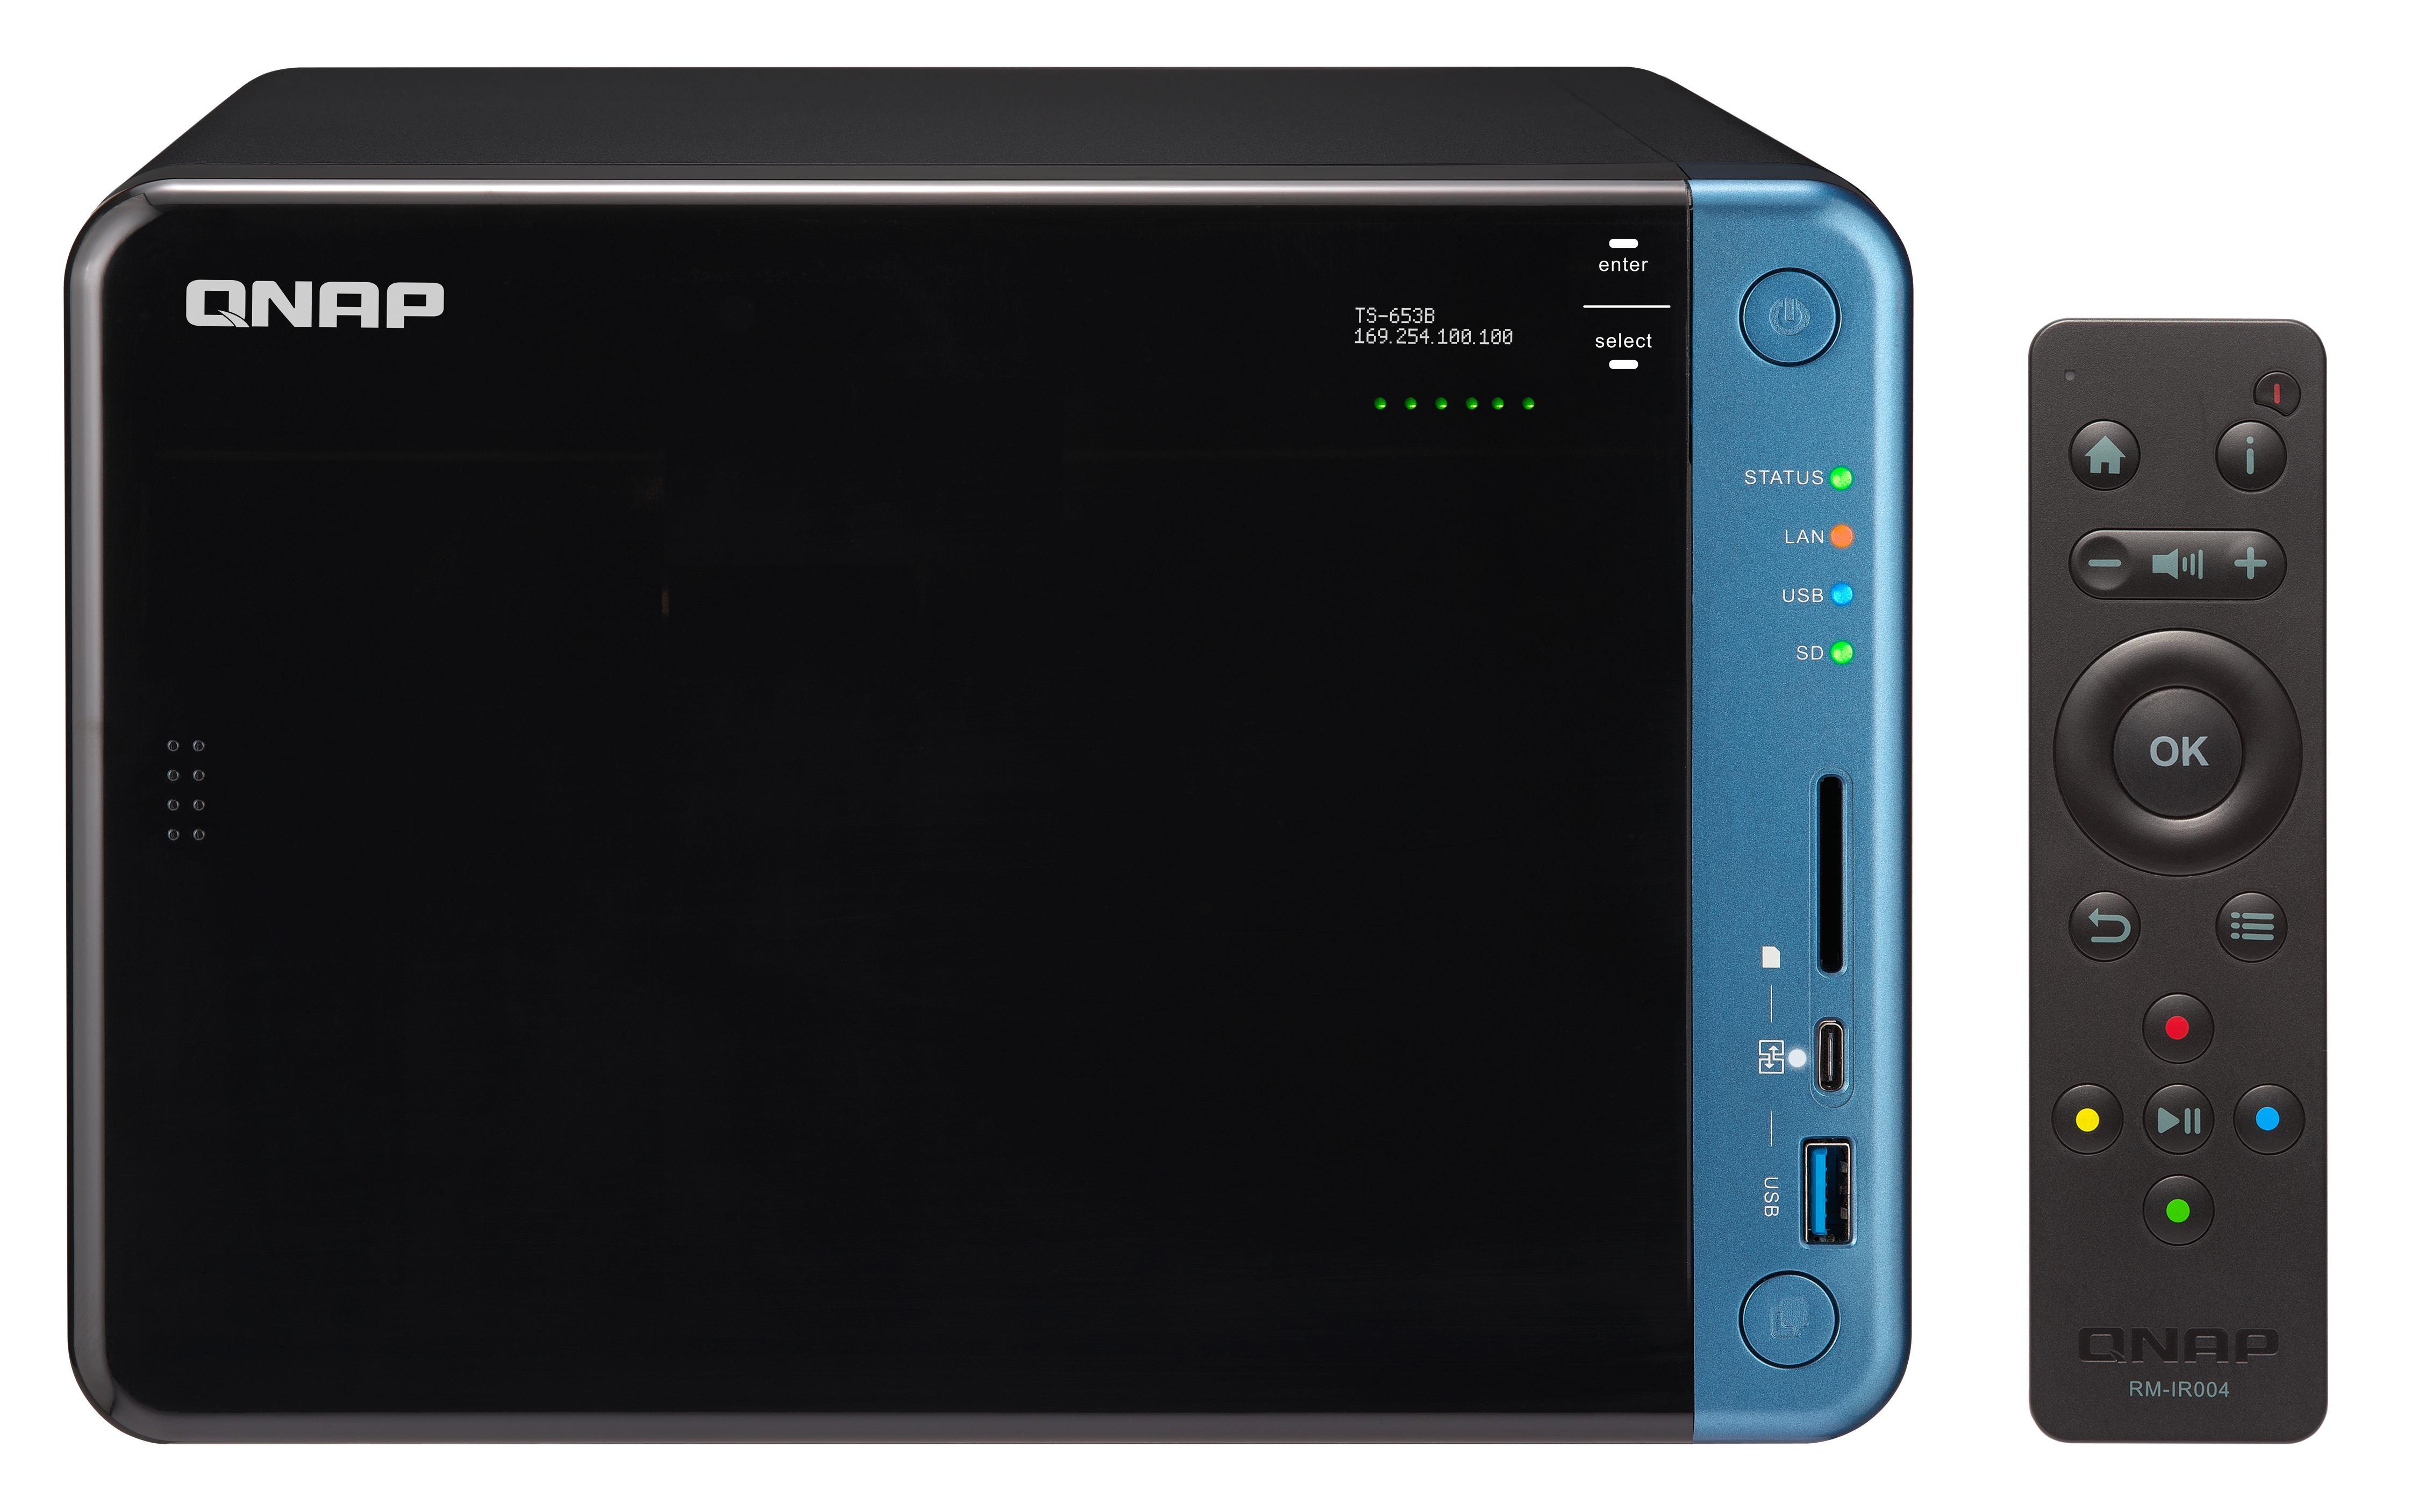 QNAP TS-653B Ethernet LAN Tower Black NAS